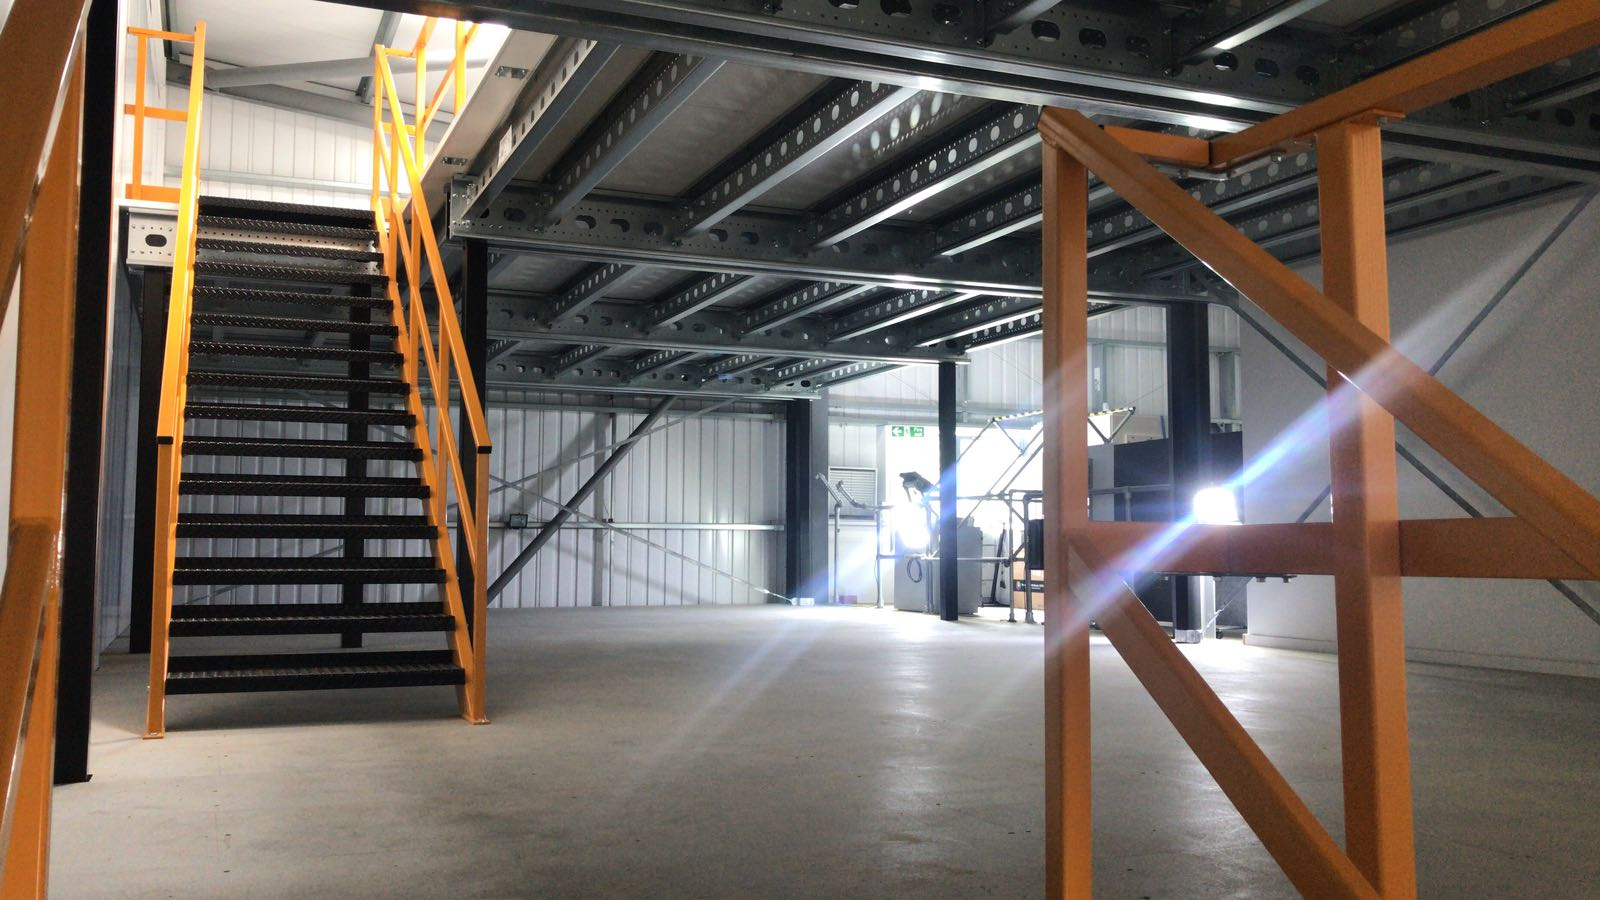 Mezzanine level | Mezzanine levels